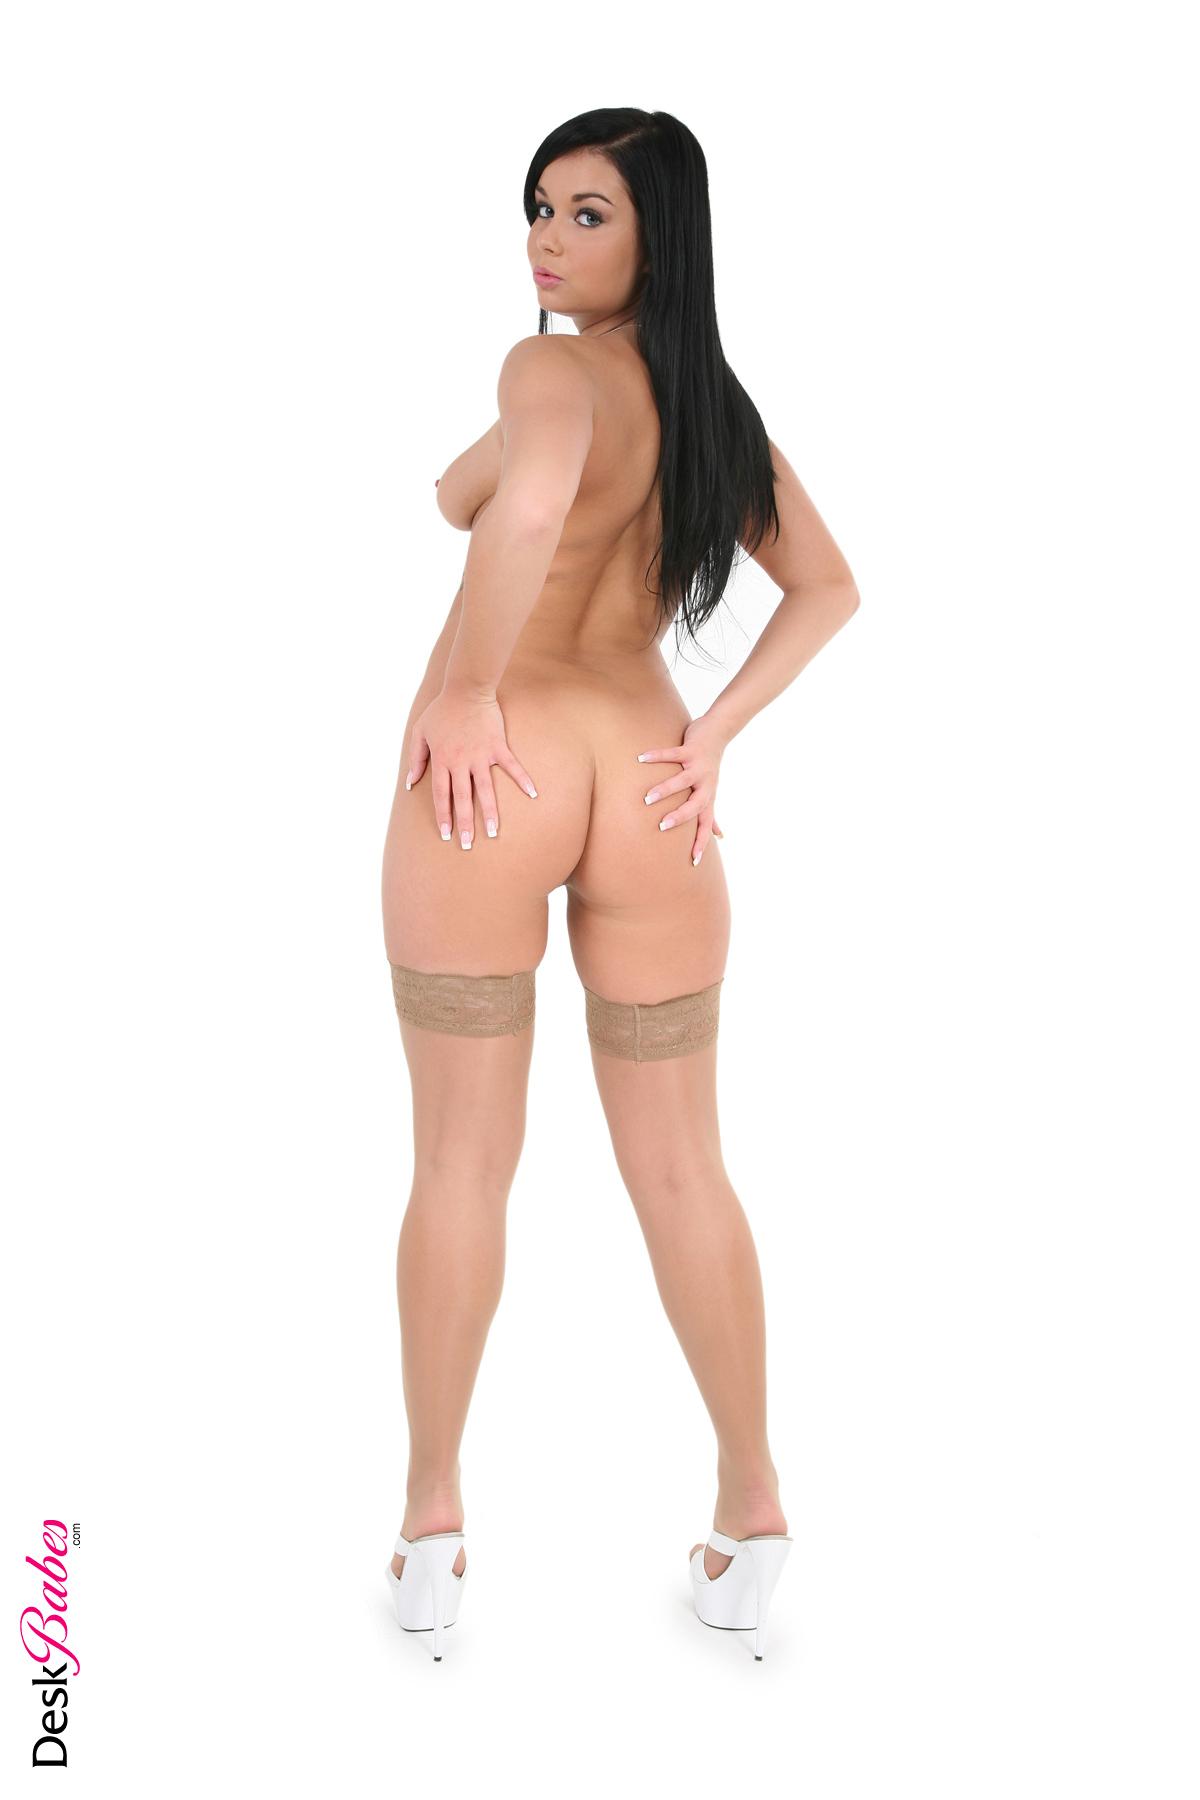 Sanaa lathan nude pussy